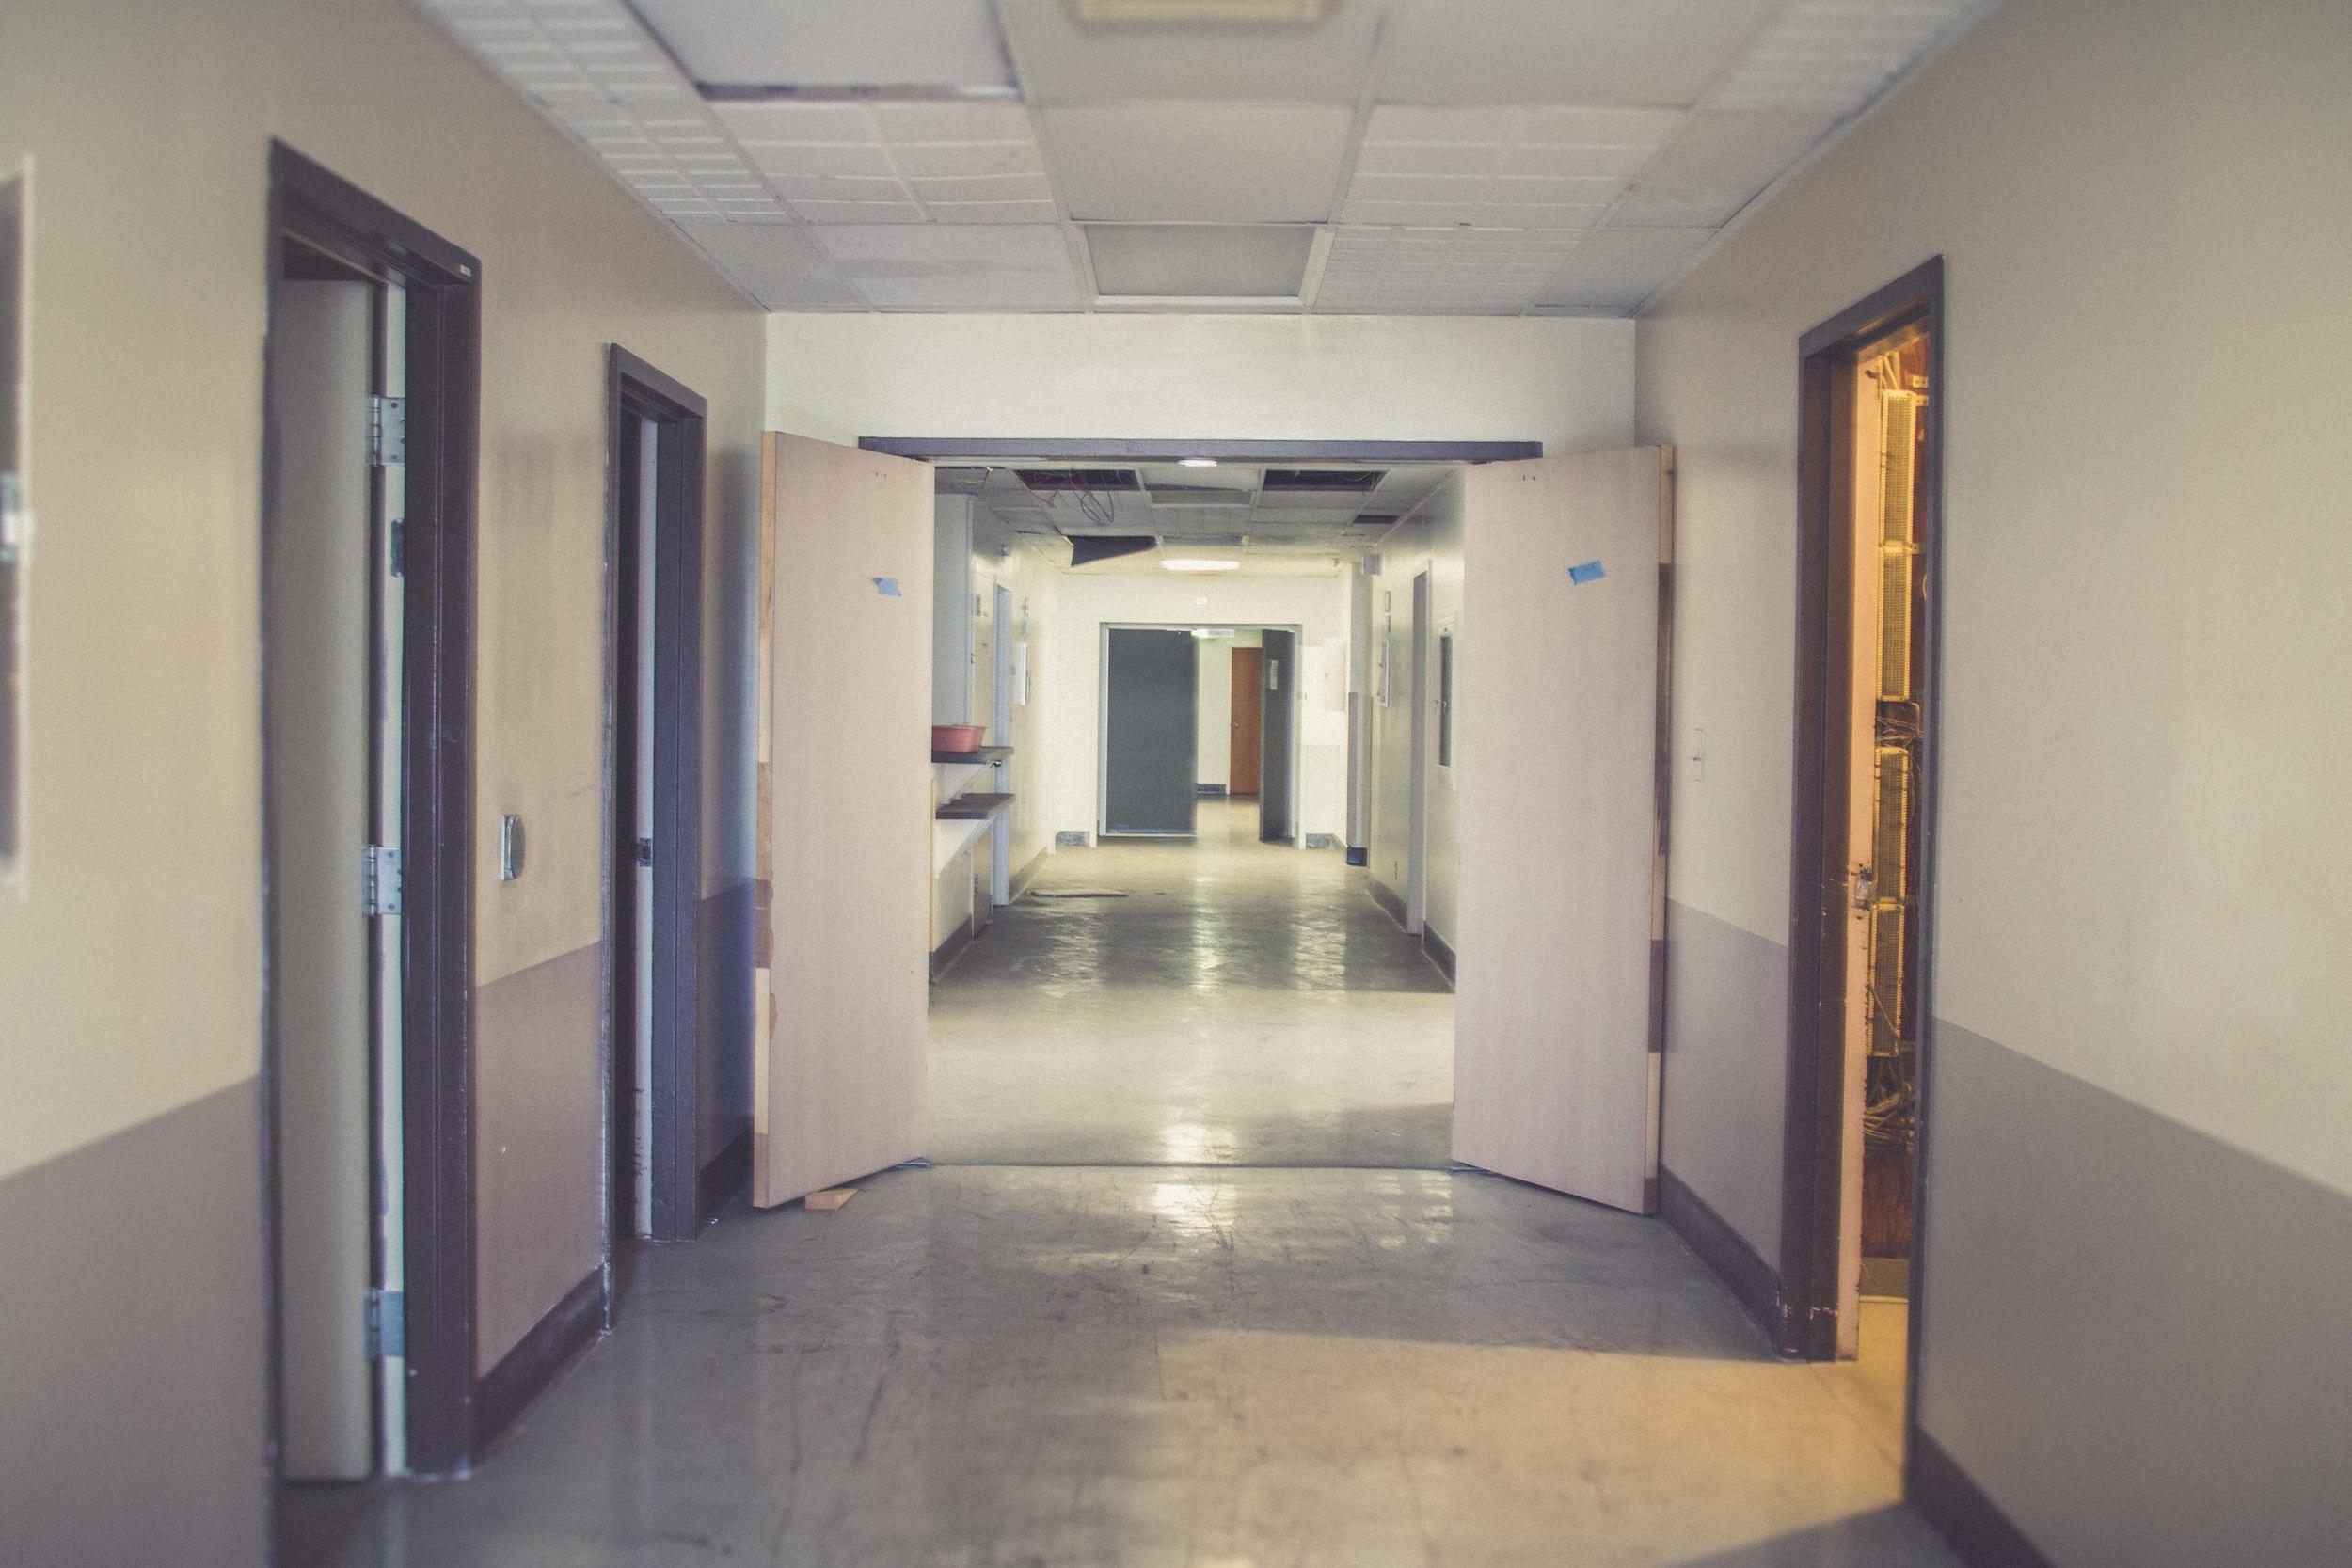 JW_Hospital-18.jpg